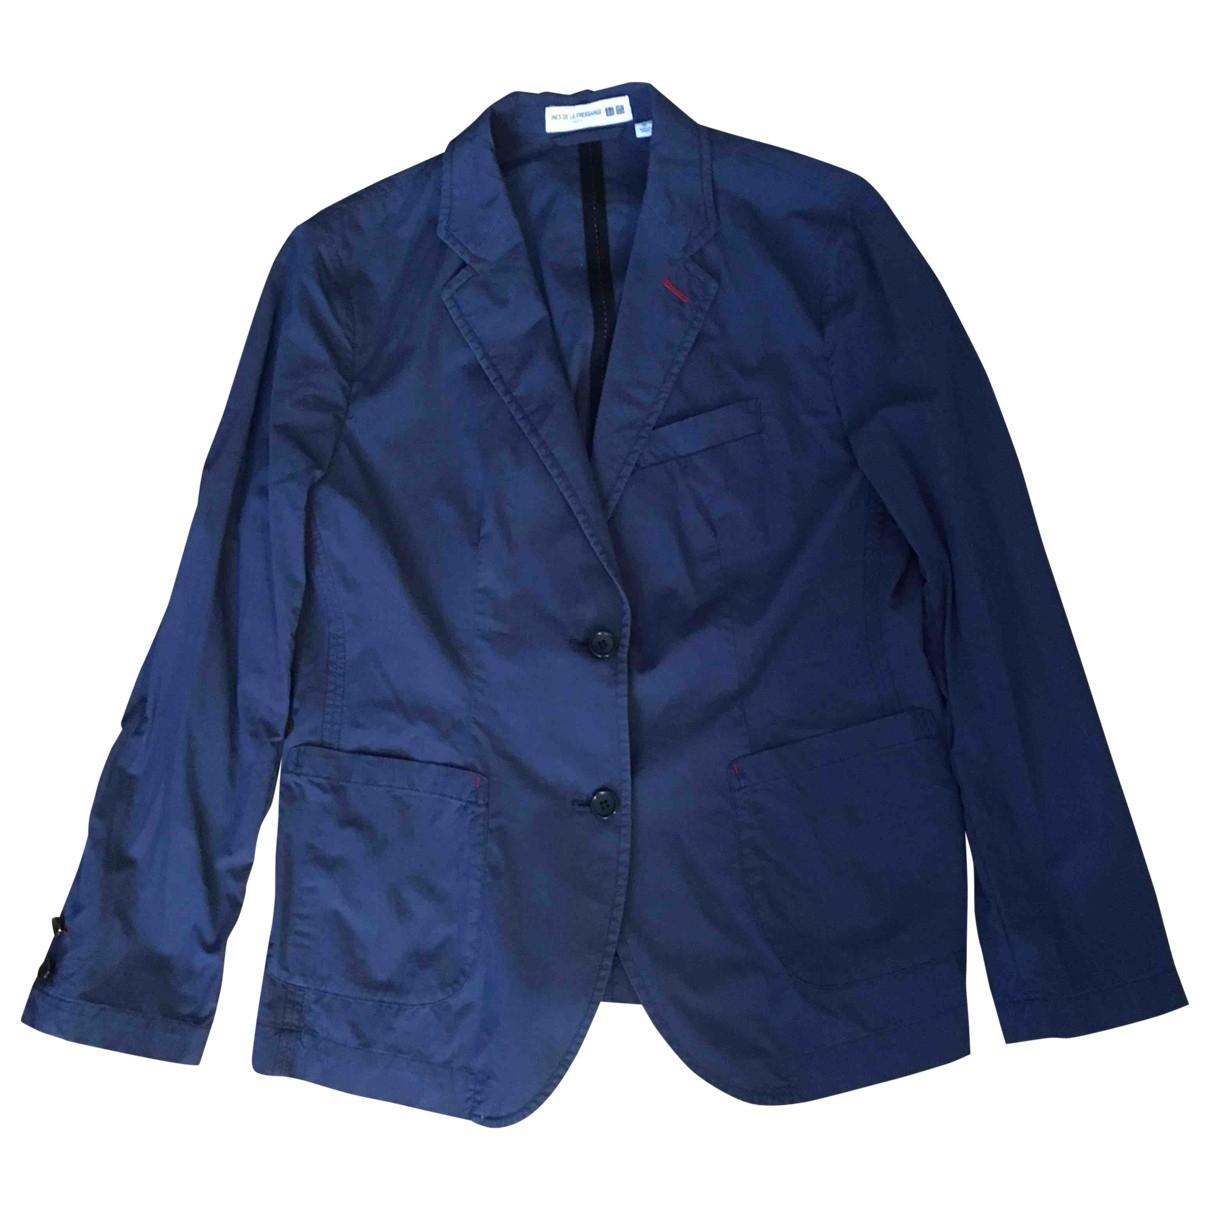 Uniqlo \N Blue Cotton jacket for Women XL International